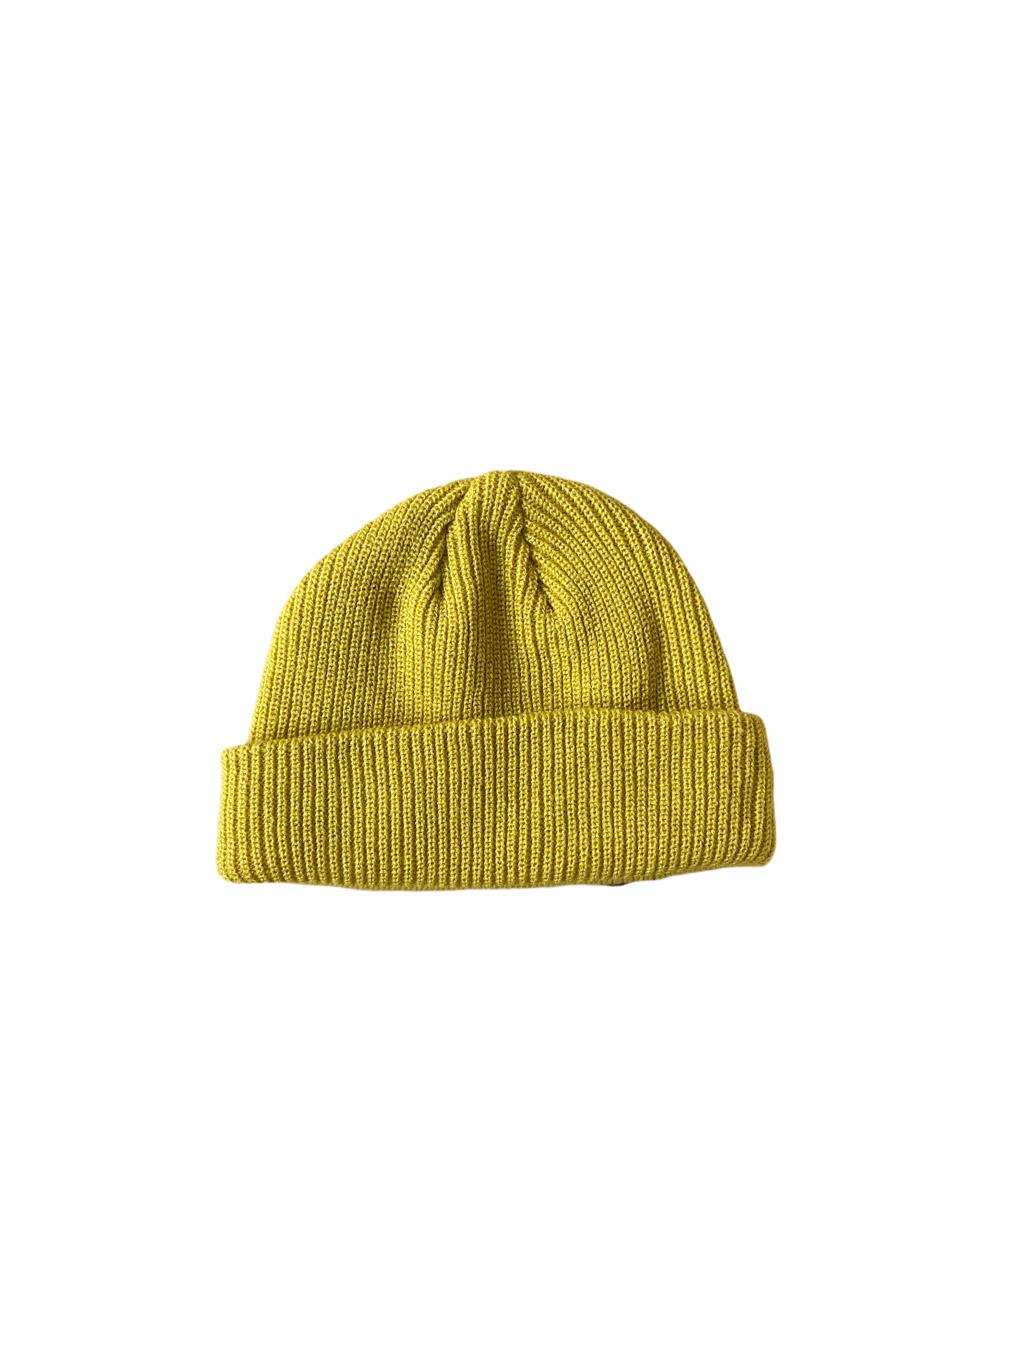 Watch Cap (Yellow)